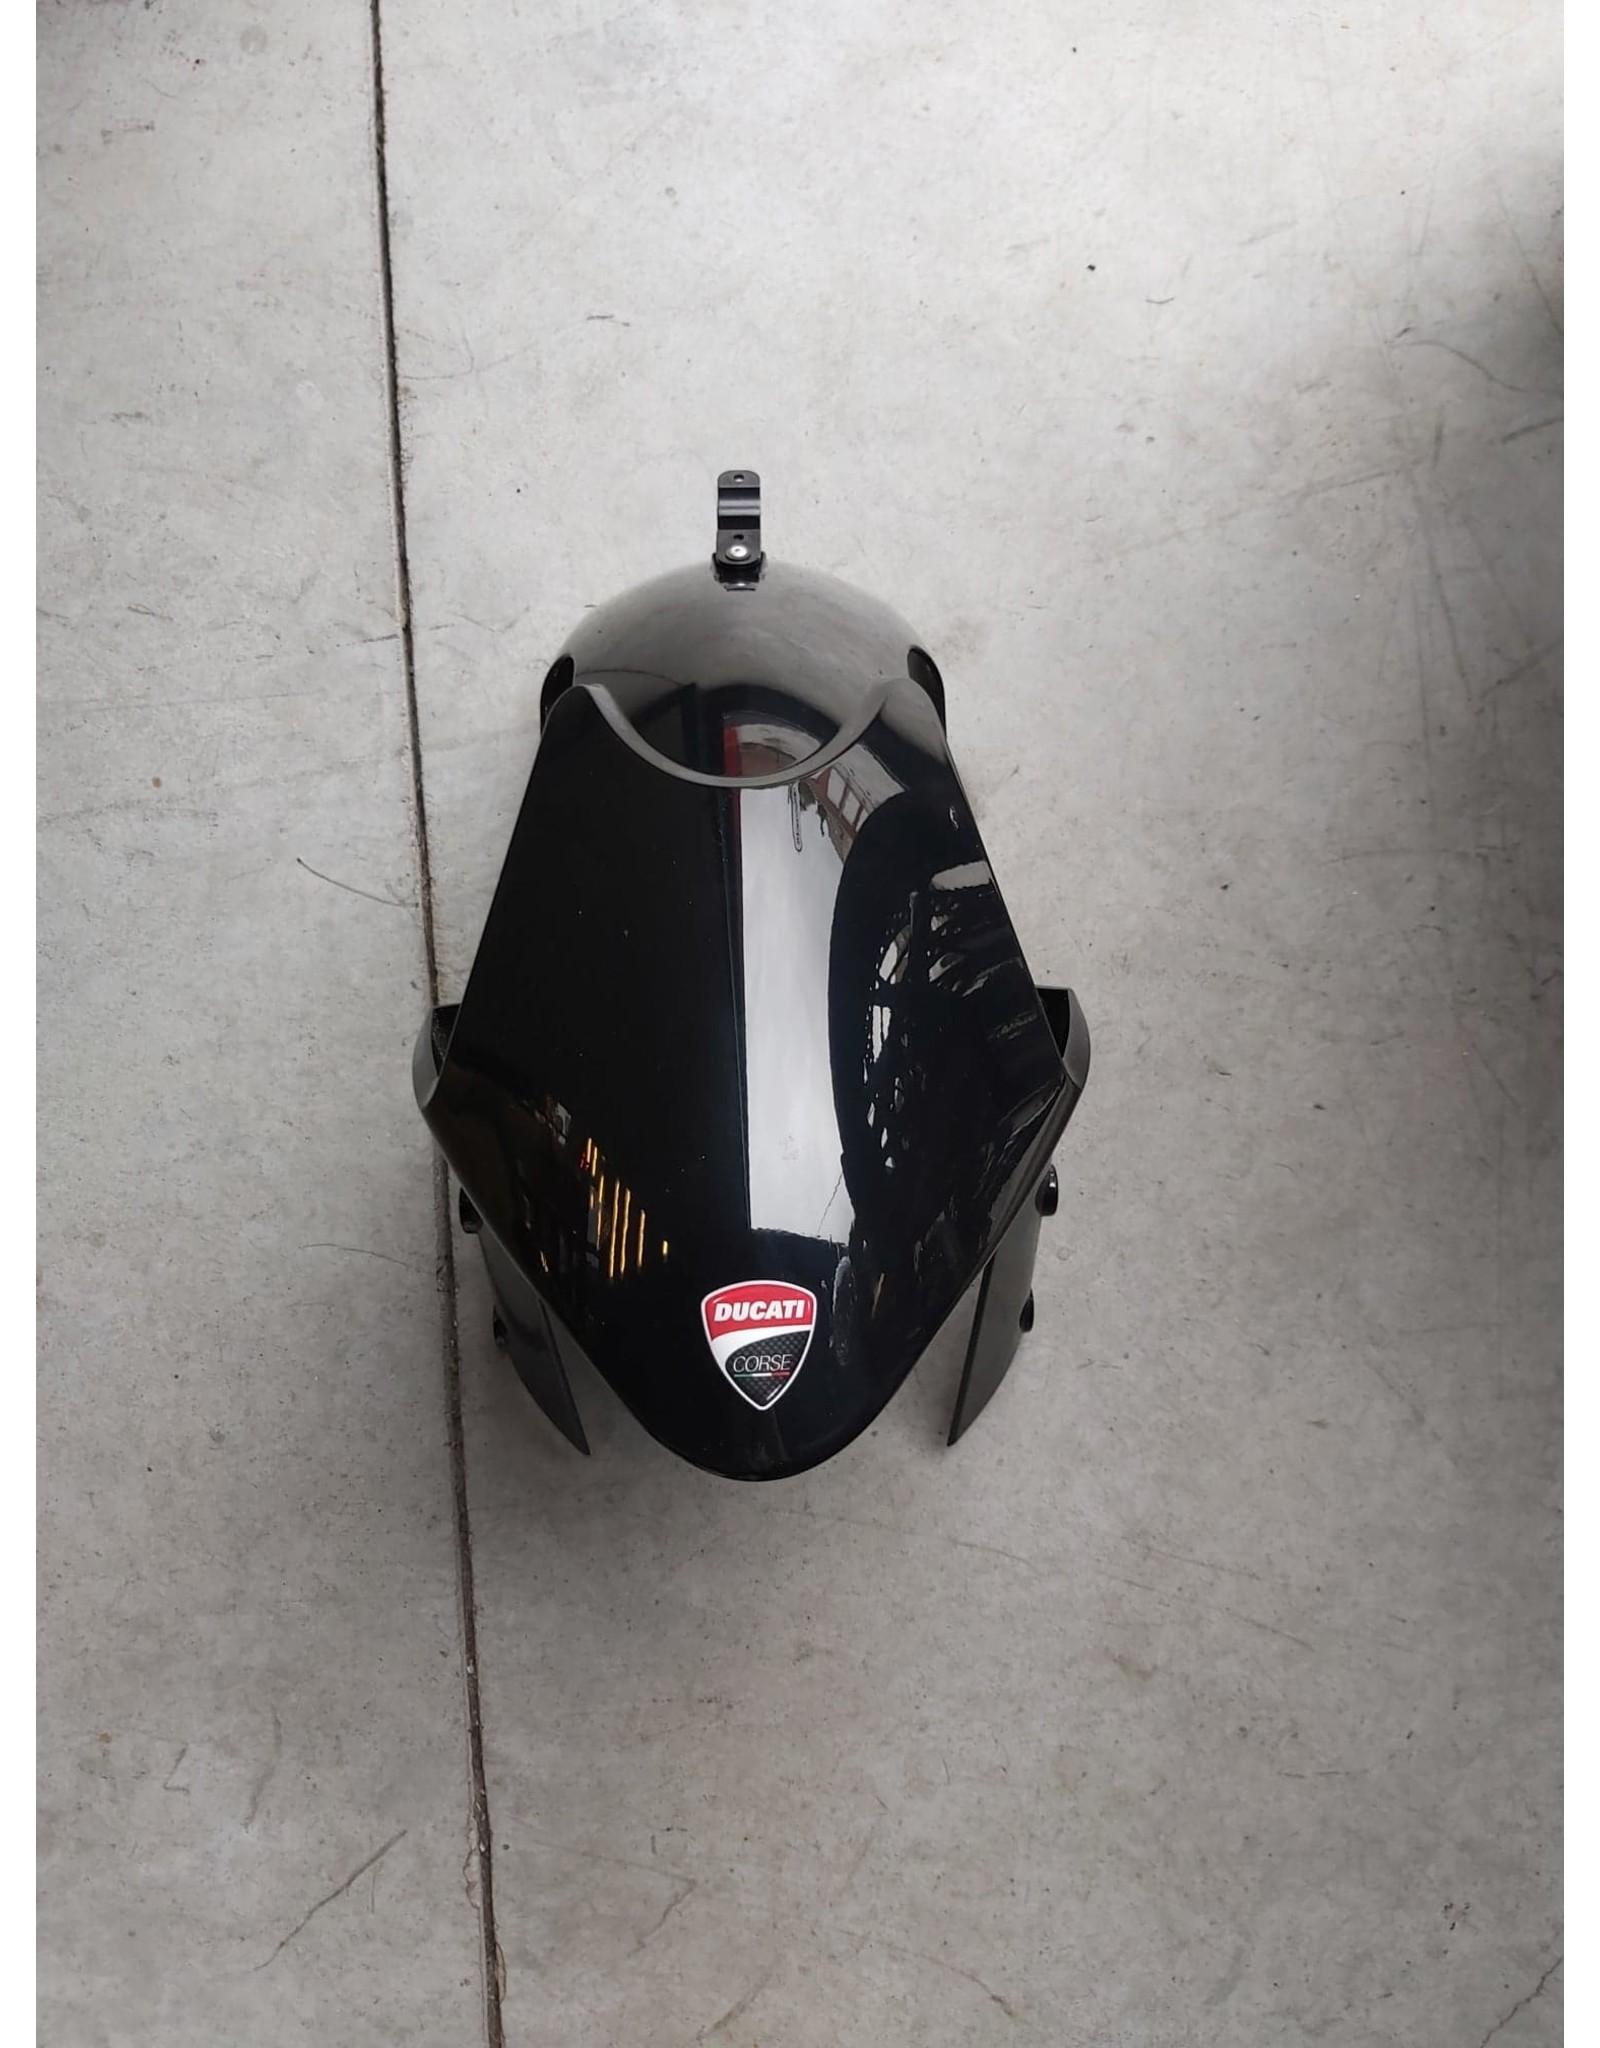 Ducati DUCATI VOORSPATBORD MONSTER 696 796 1100